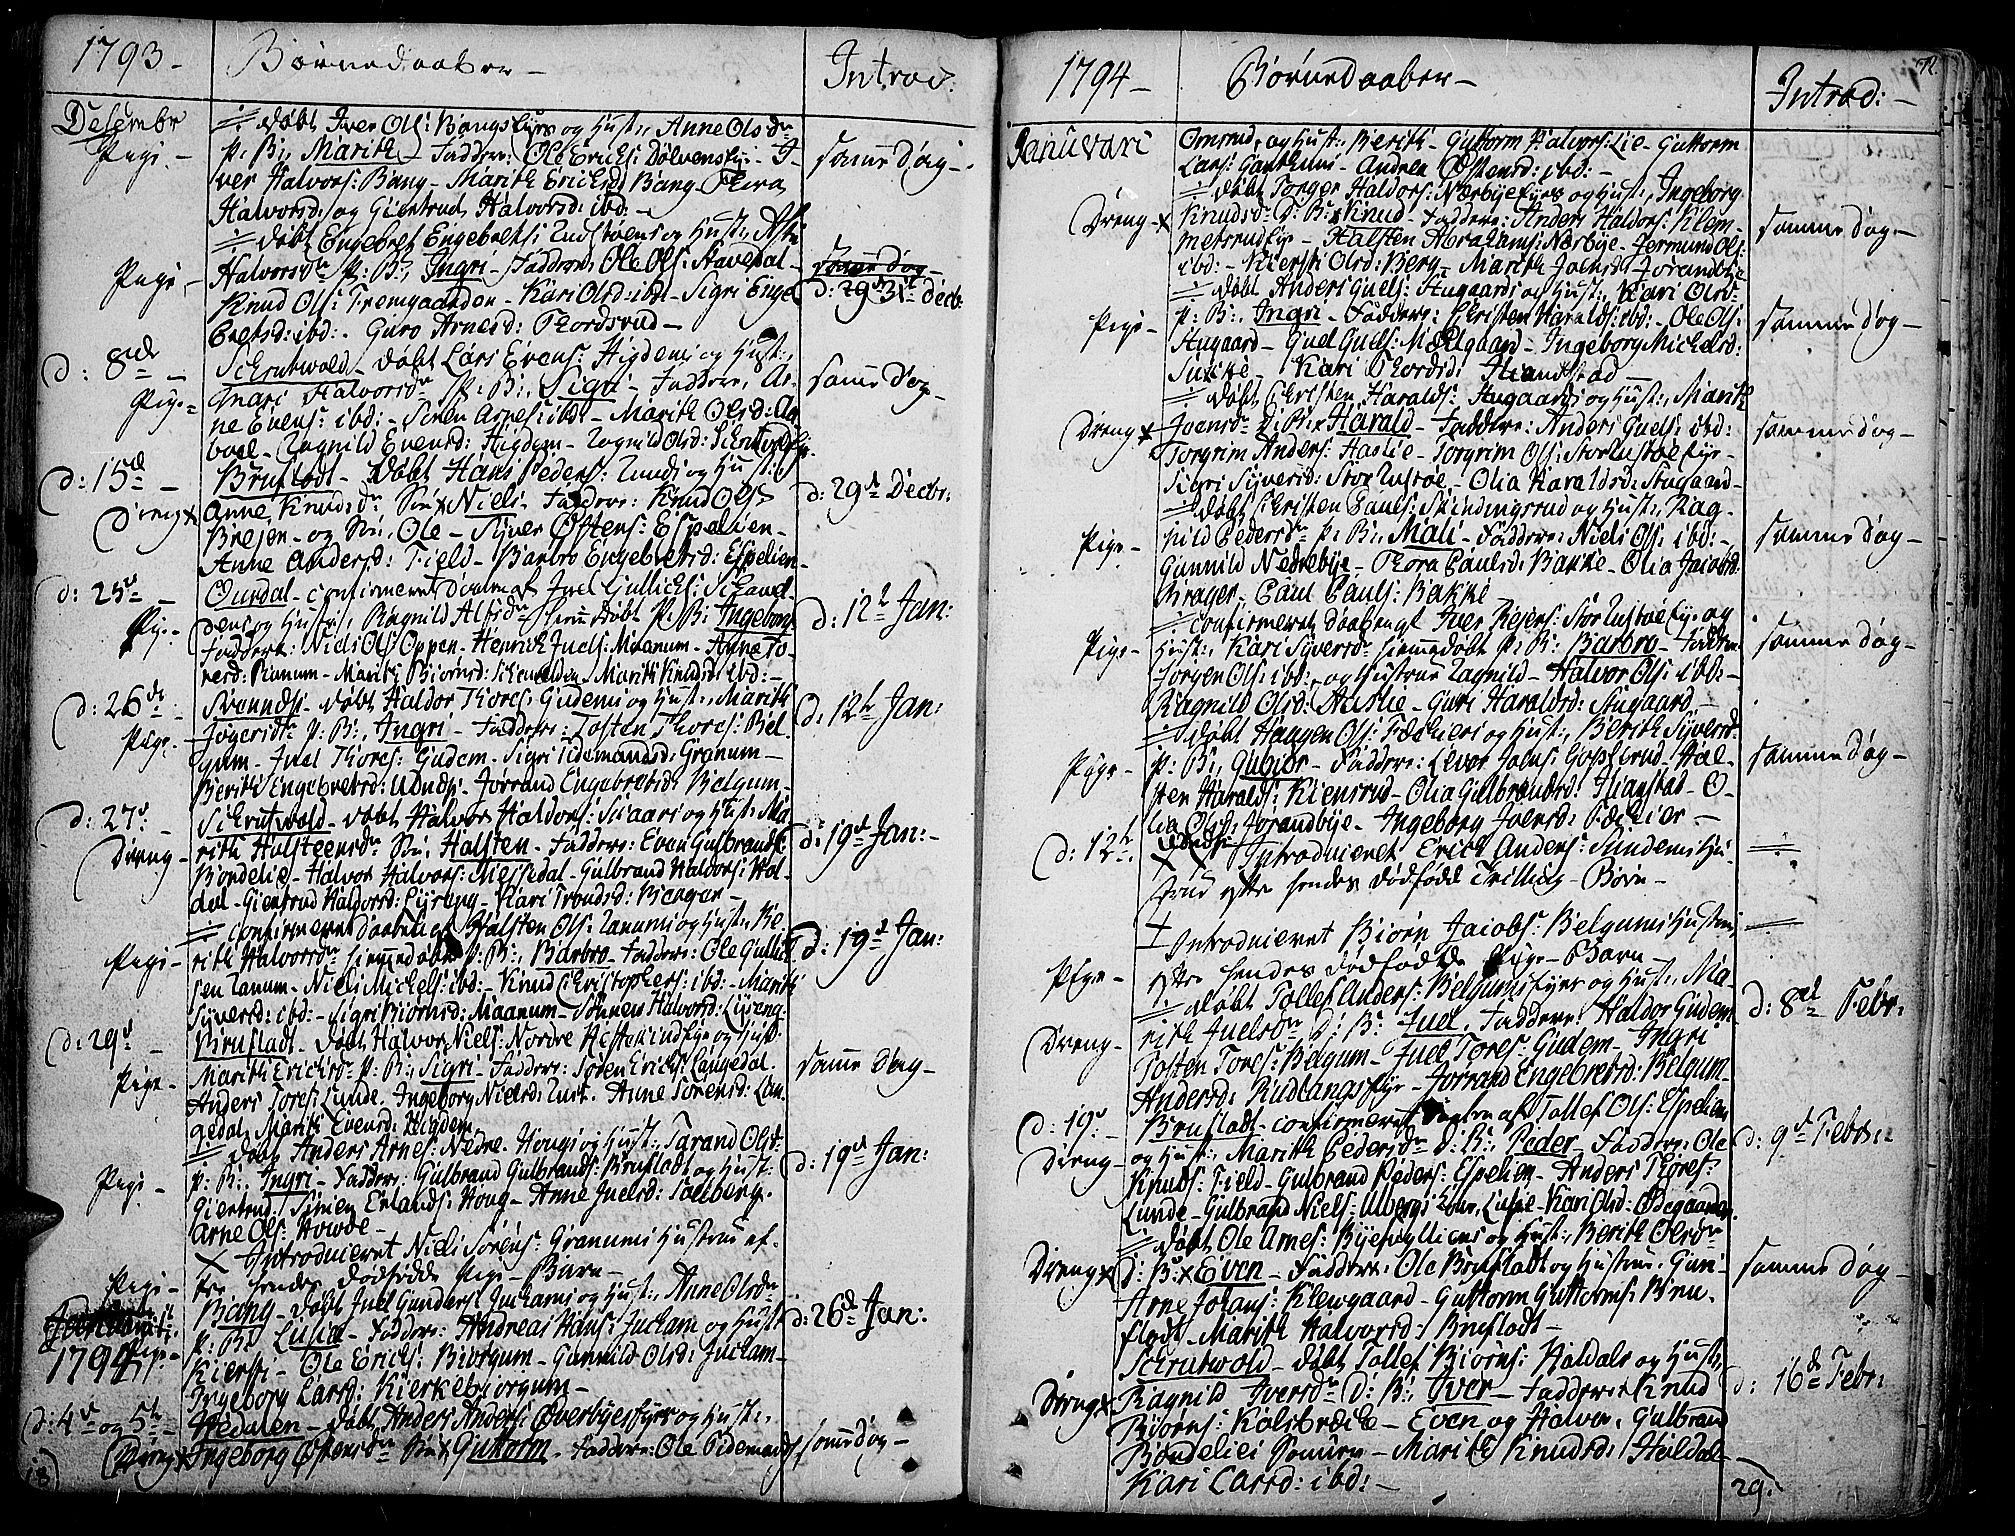 SAH, Aurdal prestekontor, Ministerialbok nr. 6, 1781-1804, s. 72